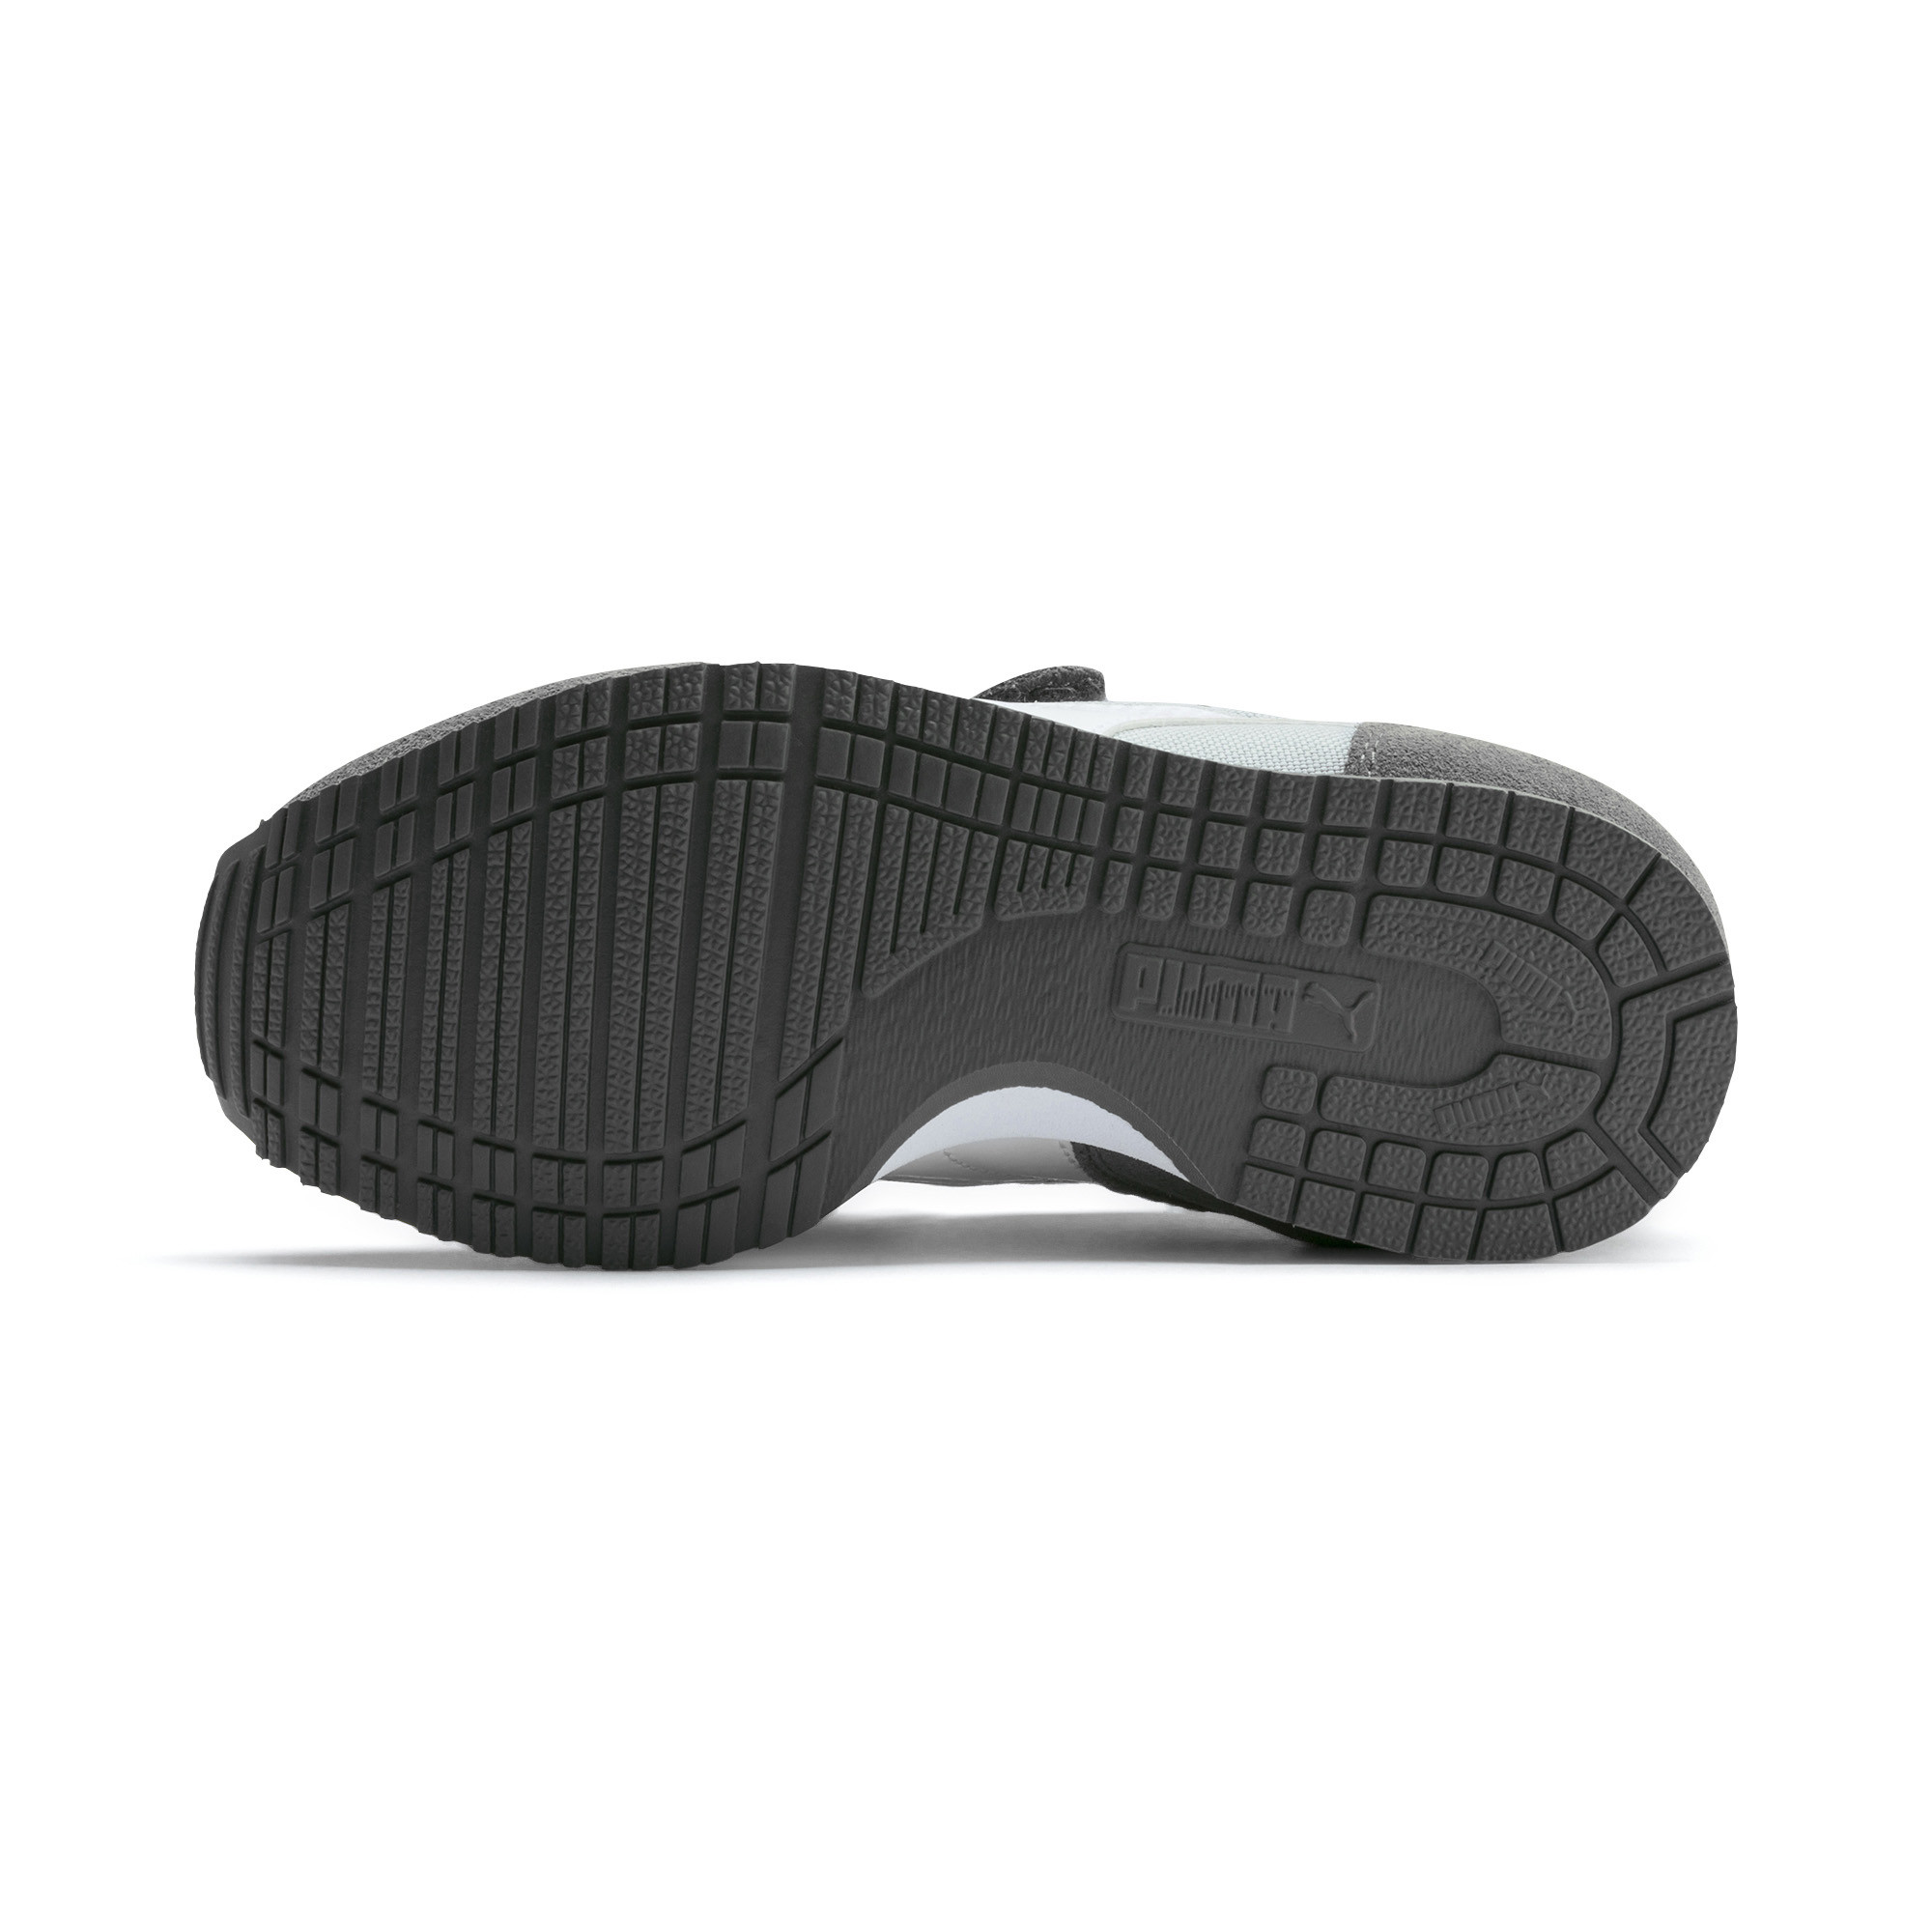 PUMA-Cabana-Racer-Little-Kids-039-Shoes-Kids-Shoe-Kids thumbnail 11